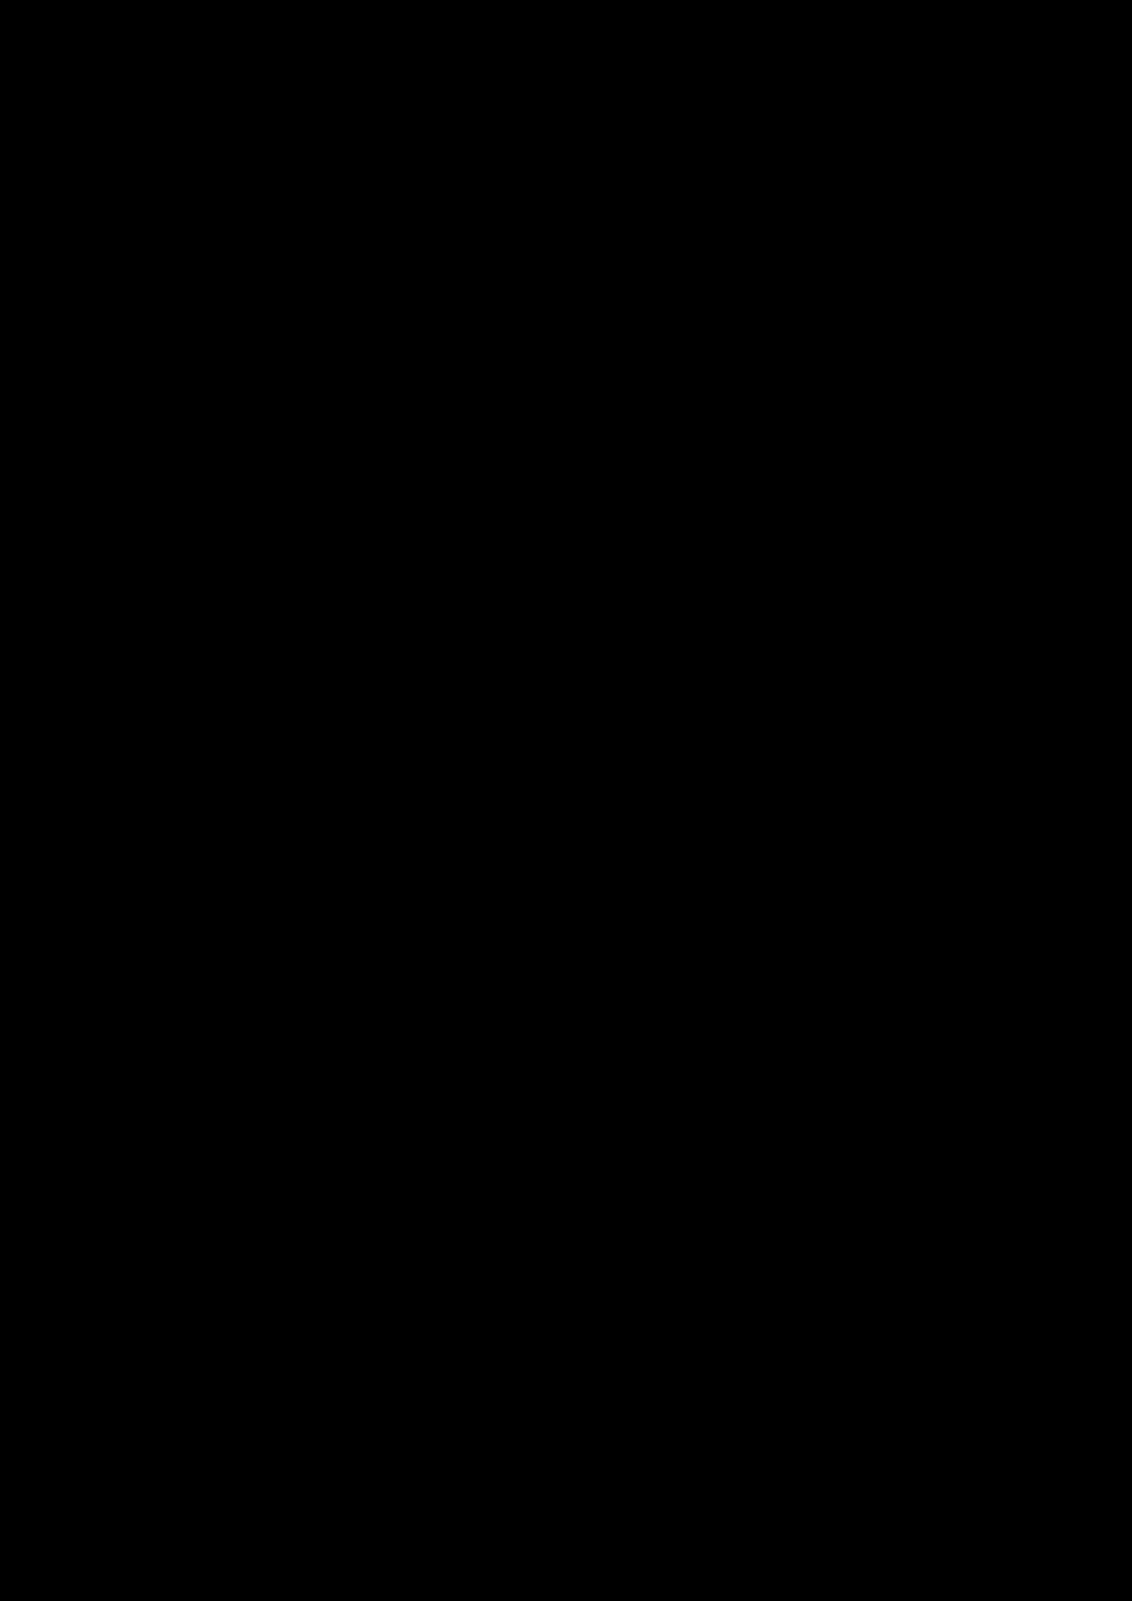 Menshe nas slide, Image 4